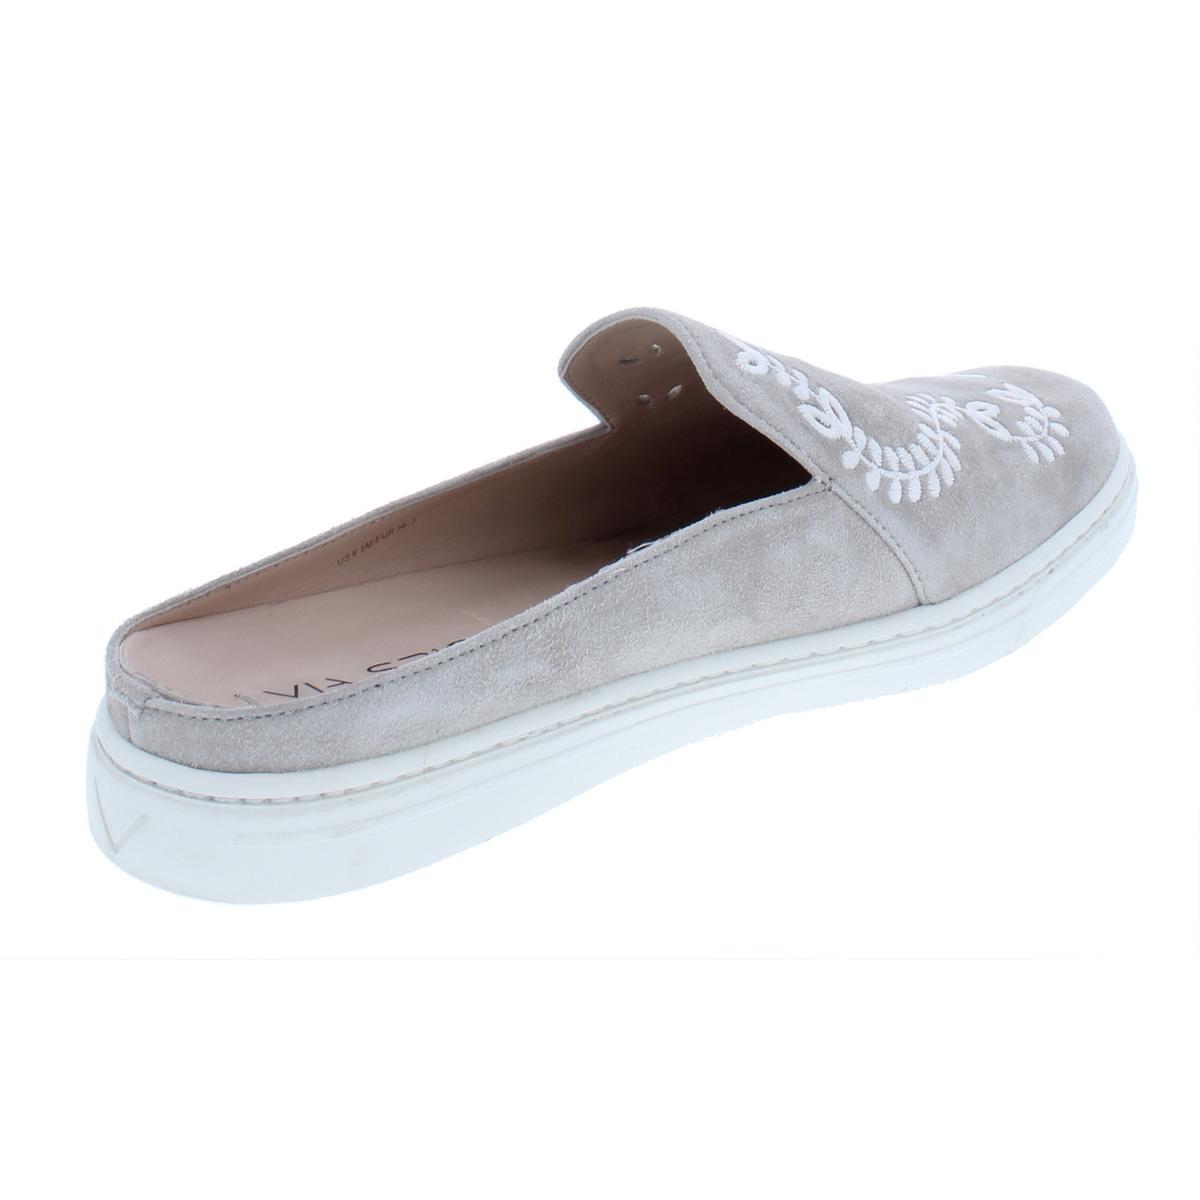 Via-Spiga-Womens-Rina-3-Embroidered-Fashion-Mules-Shoes-BHFO-8835 thumbnail 4